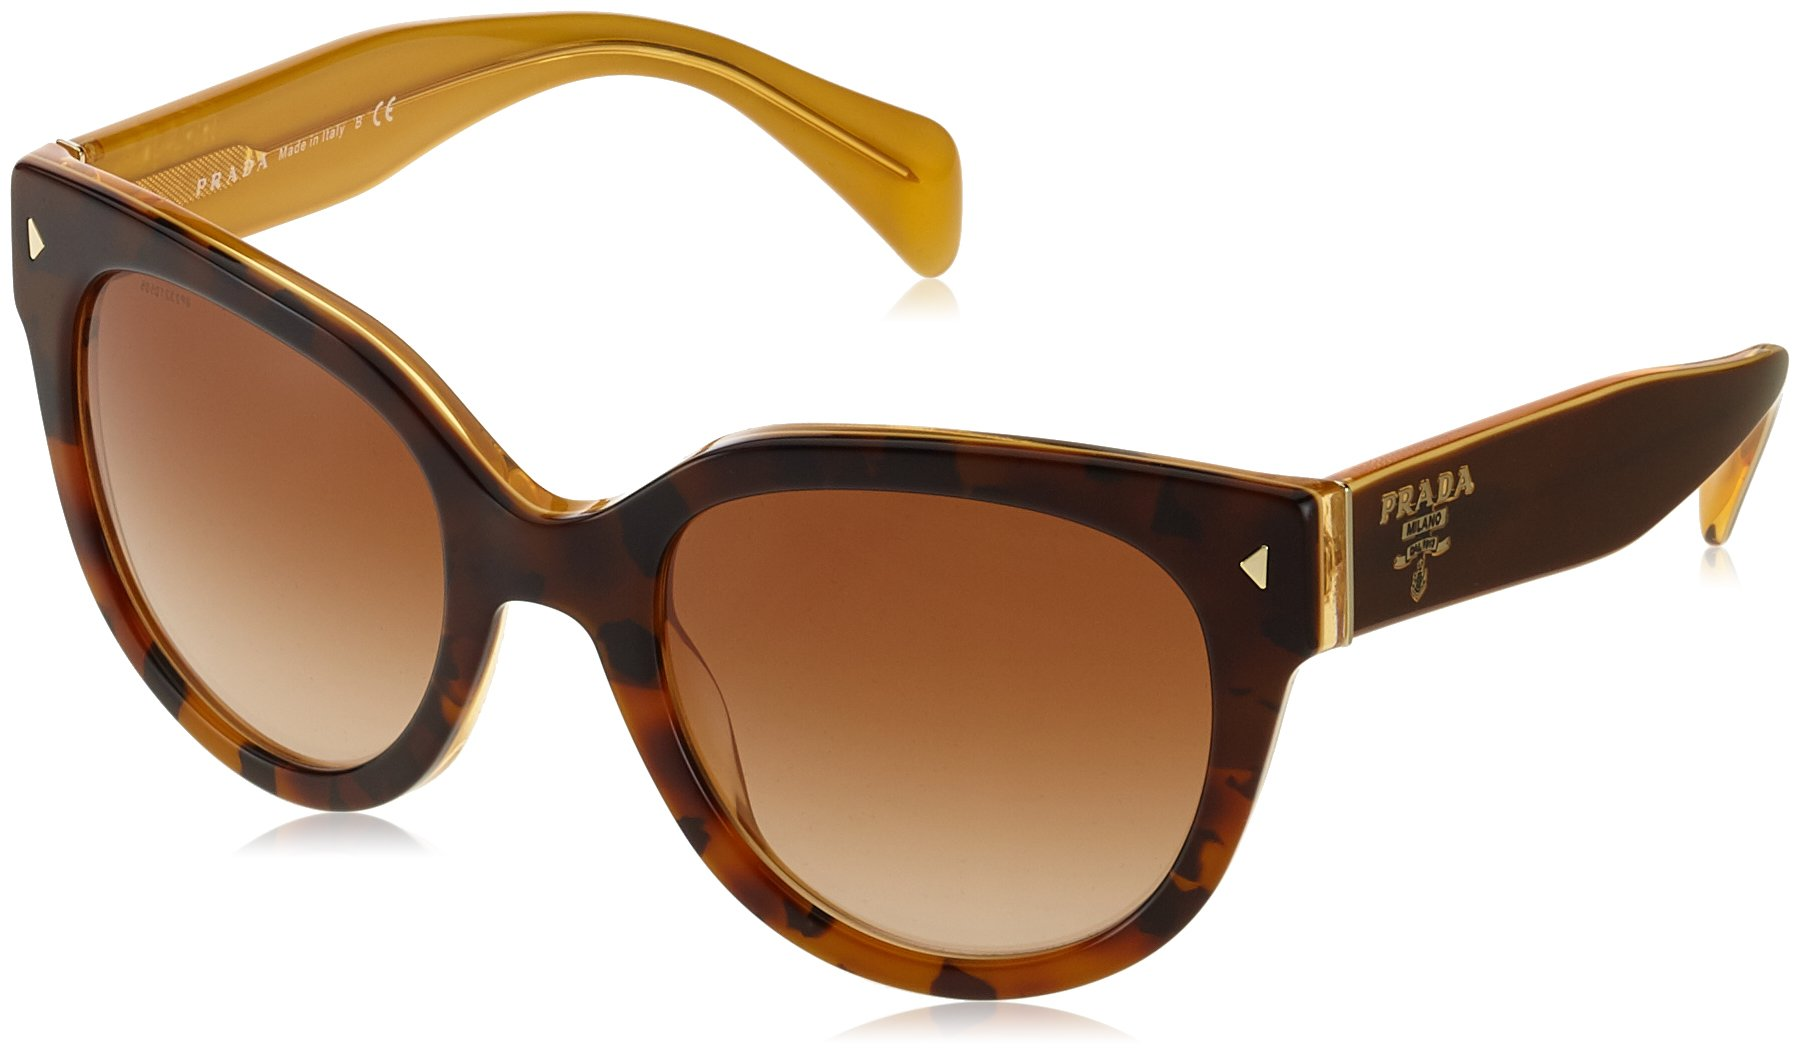 Prada Women's PRL17OS FAL-1Z1 Sunglasses, Top Light Havana/Opal Yellow/Brown Gradient, 54mm